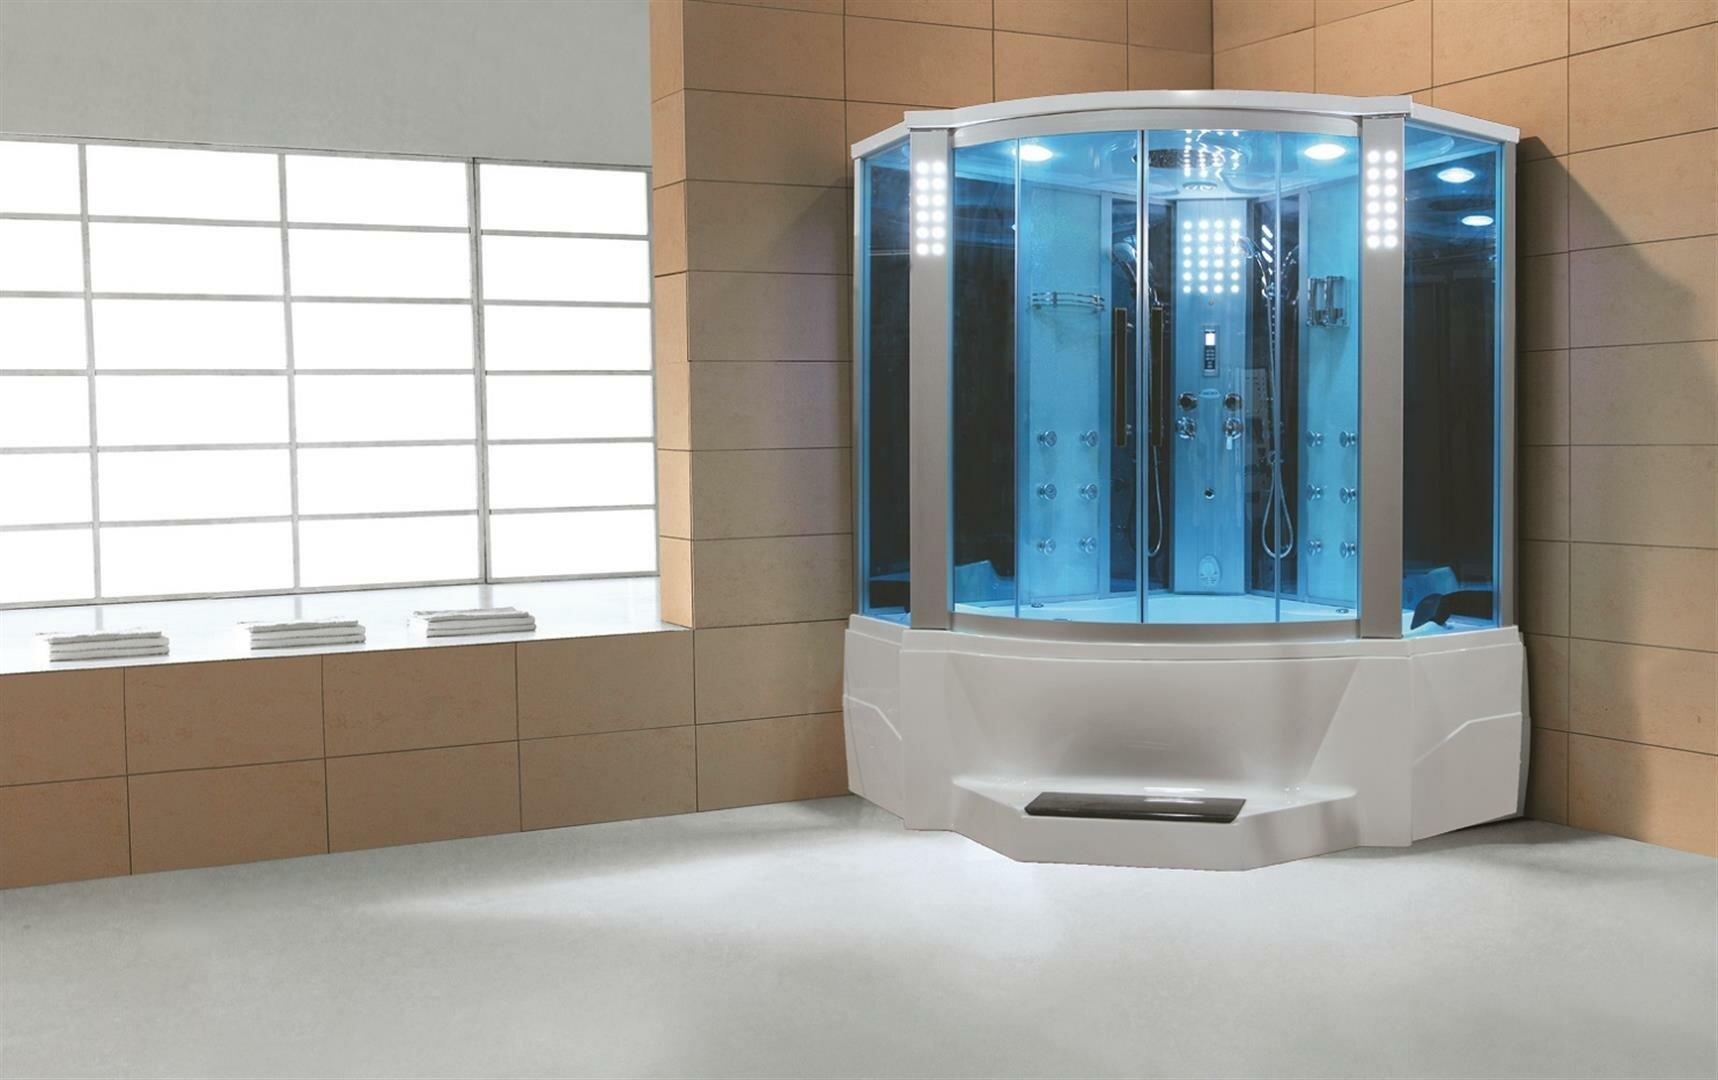 Eagle Bath 66 X 86 6 Neo Angle Sliding Steam Shower With Base Included Wayfair